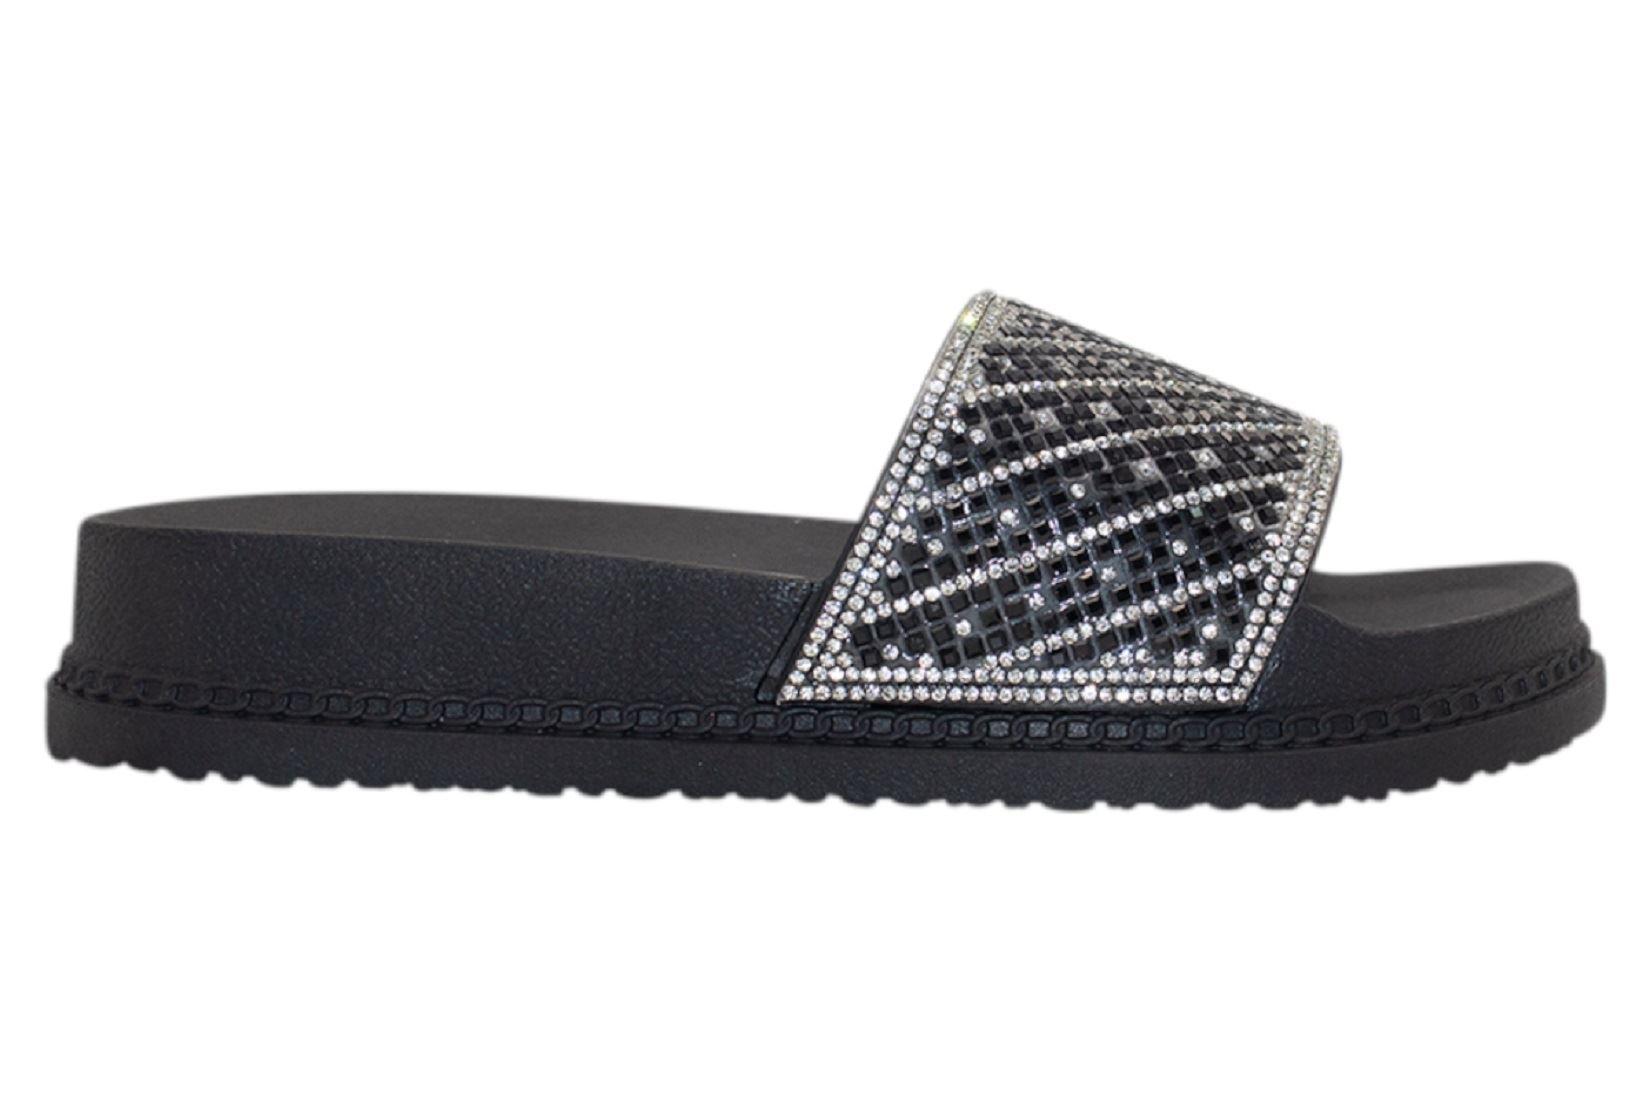 Womens-Sliders-Casual-Slippers-Mules-Ladies-Diamante-Flip-Flop-Sandals-Shoes thumbnail 3